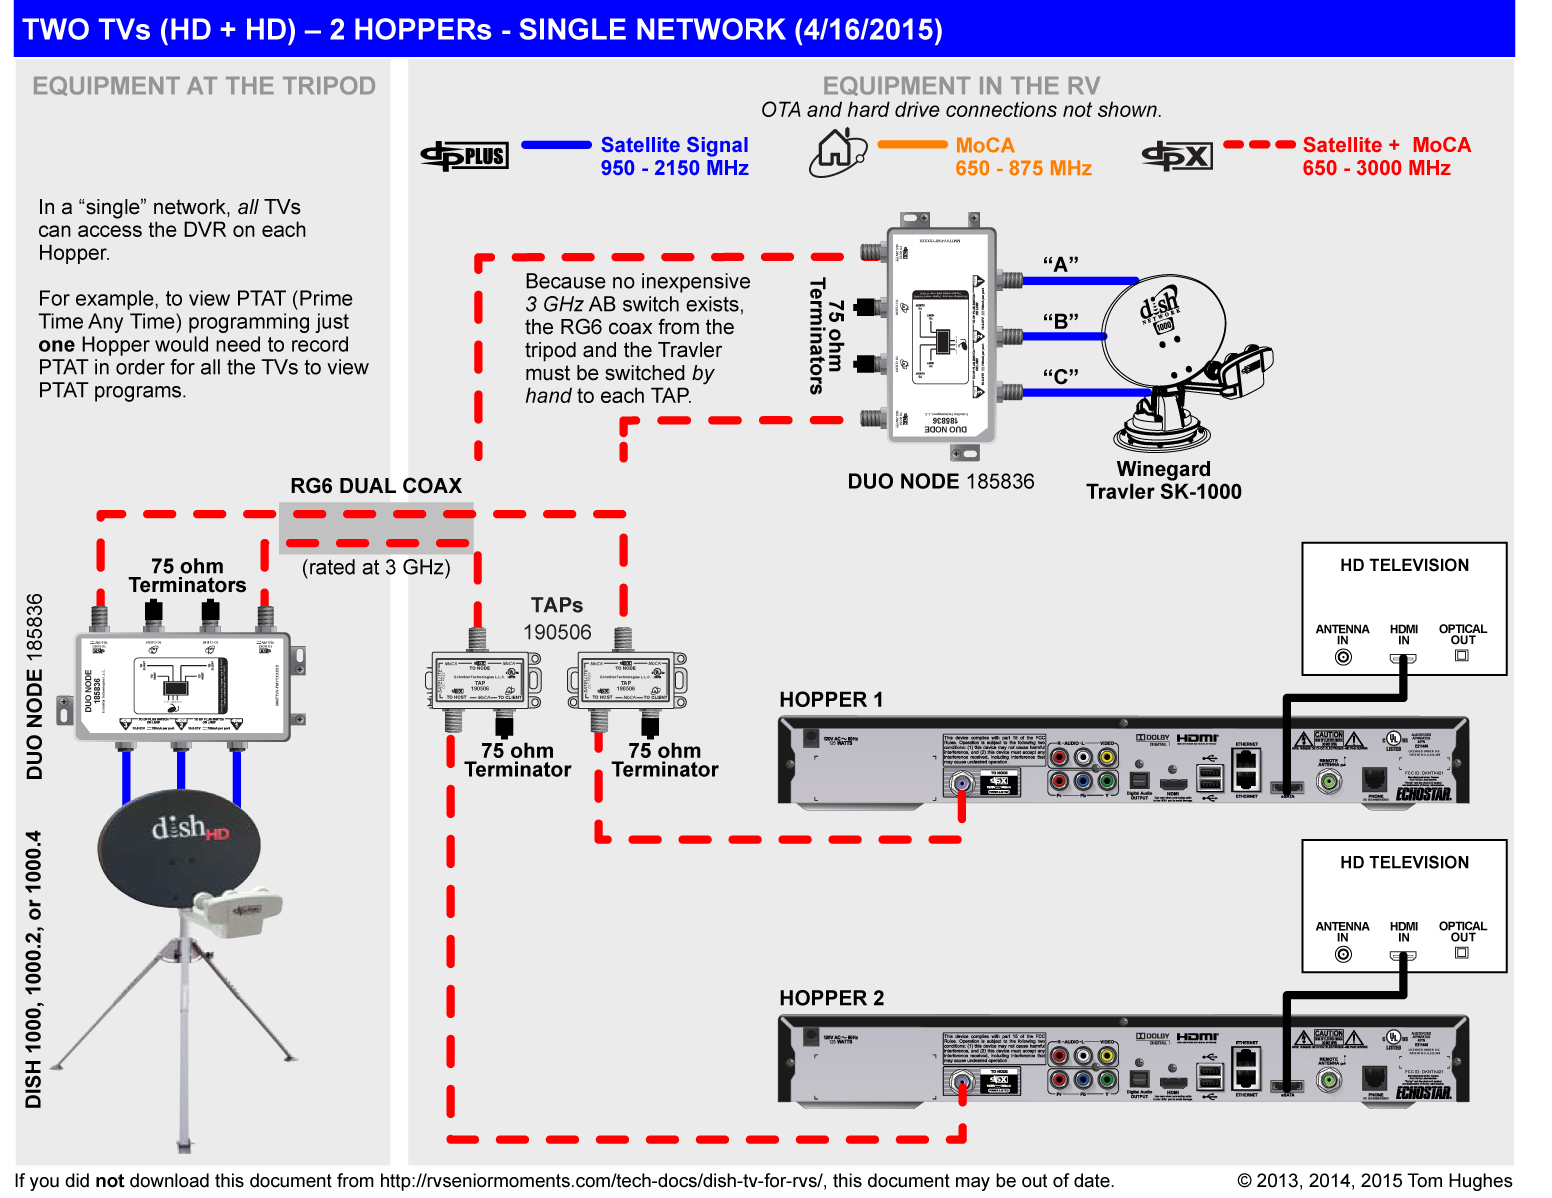 directv wiring diagram swm gm parts search dish network satellite setup diagrams schematic